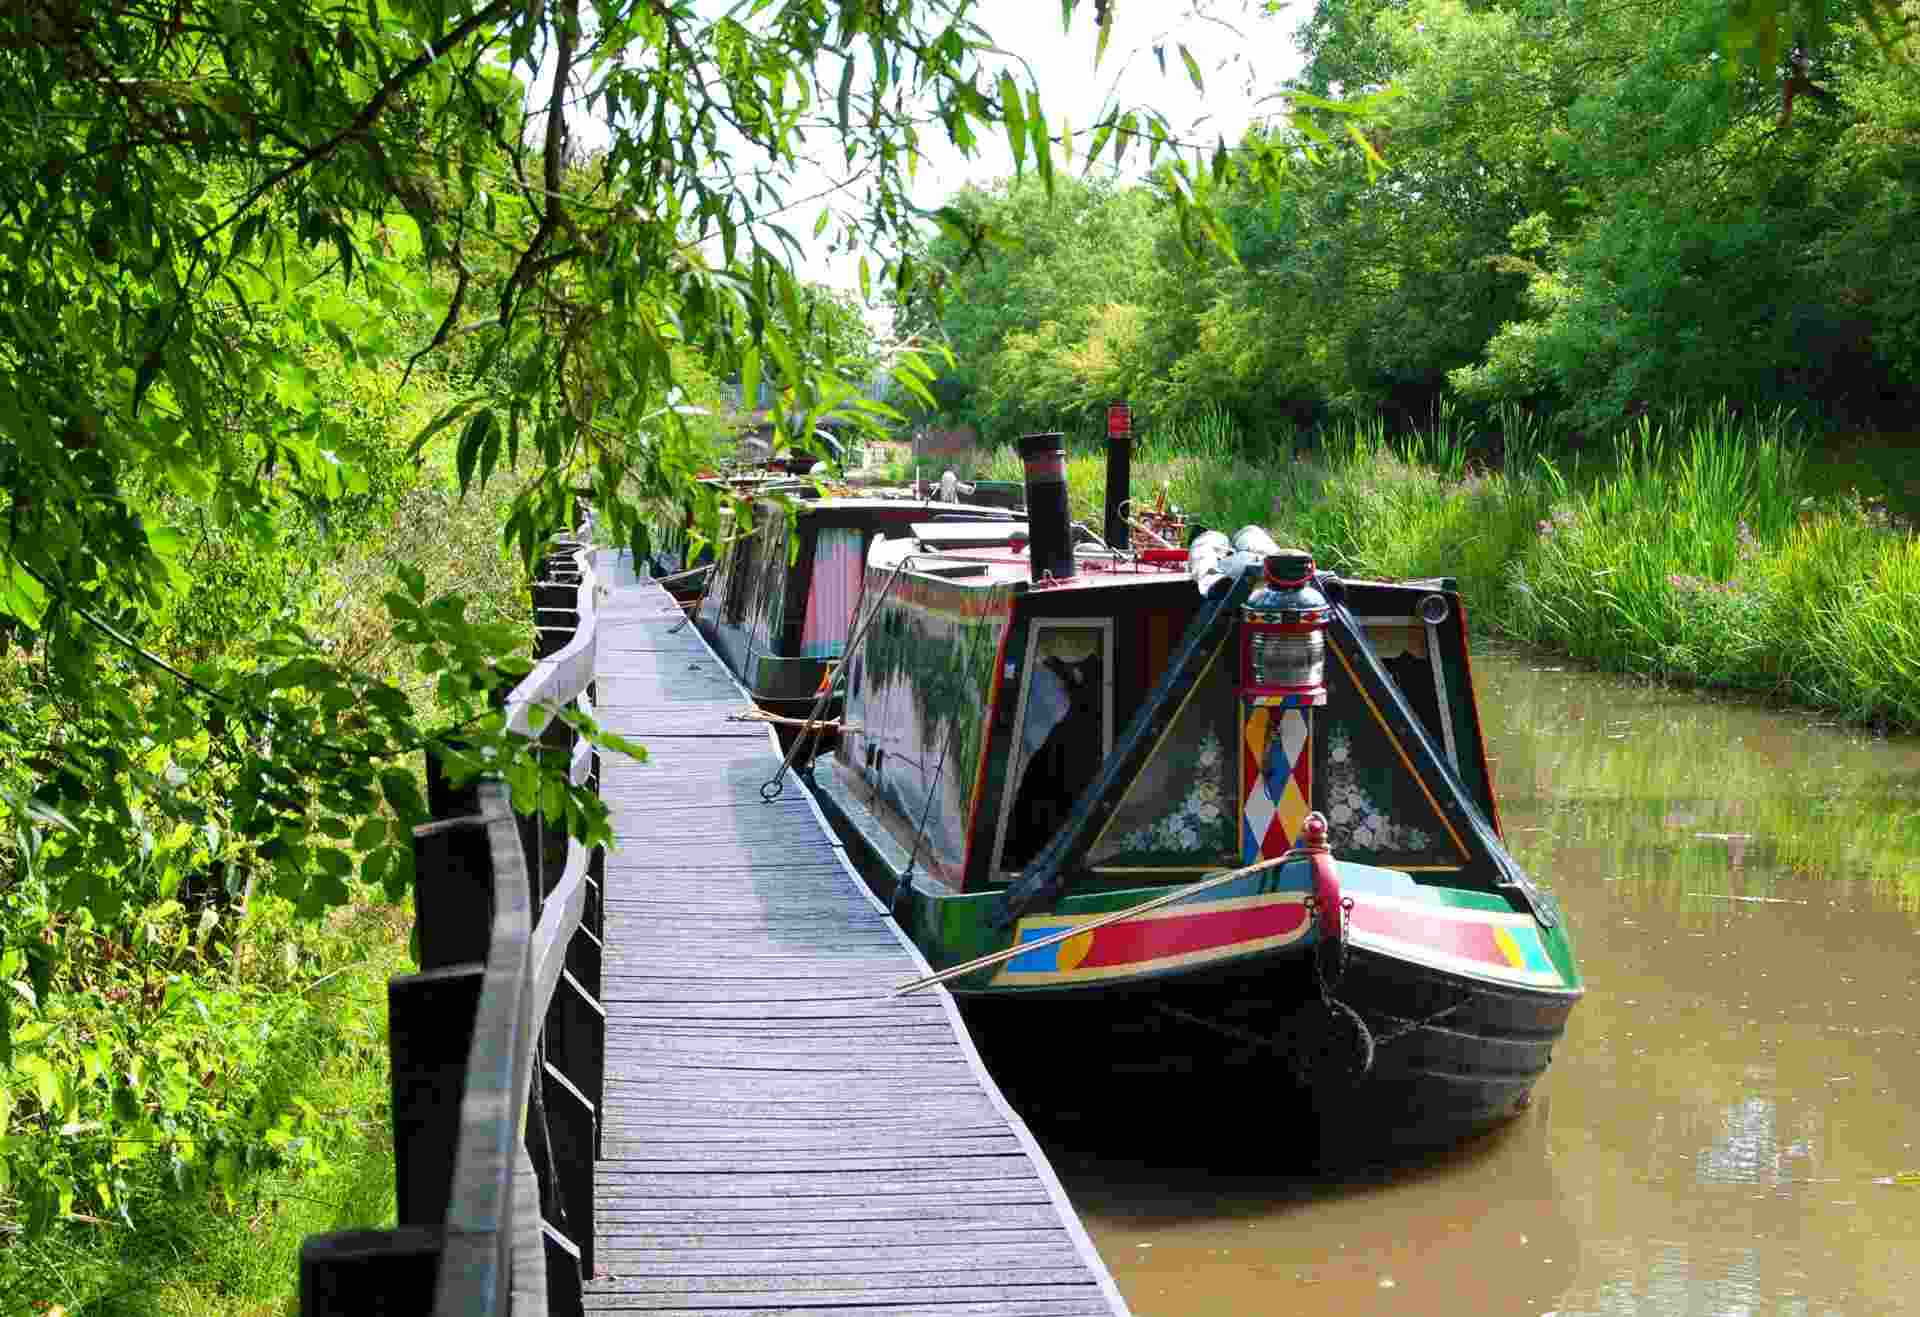 narrowboats docked by canal